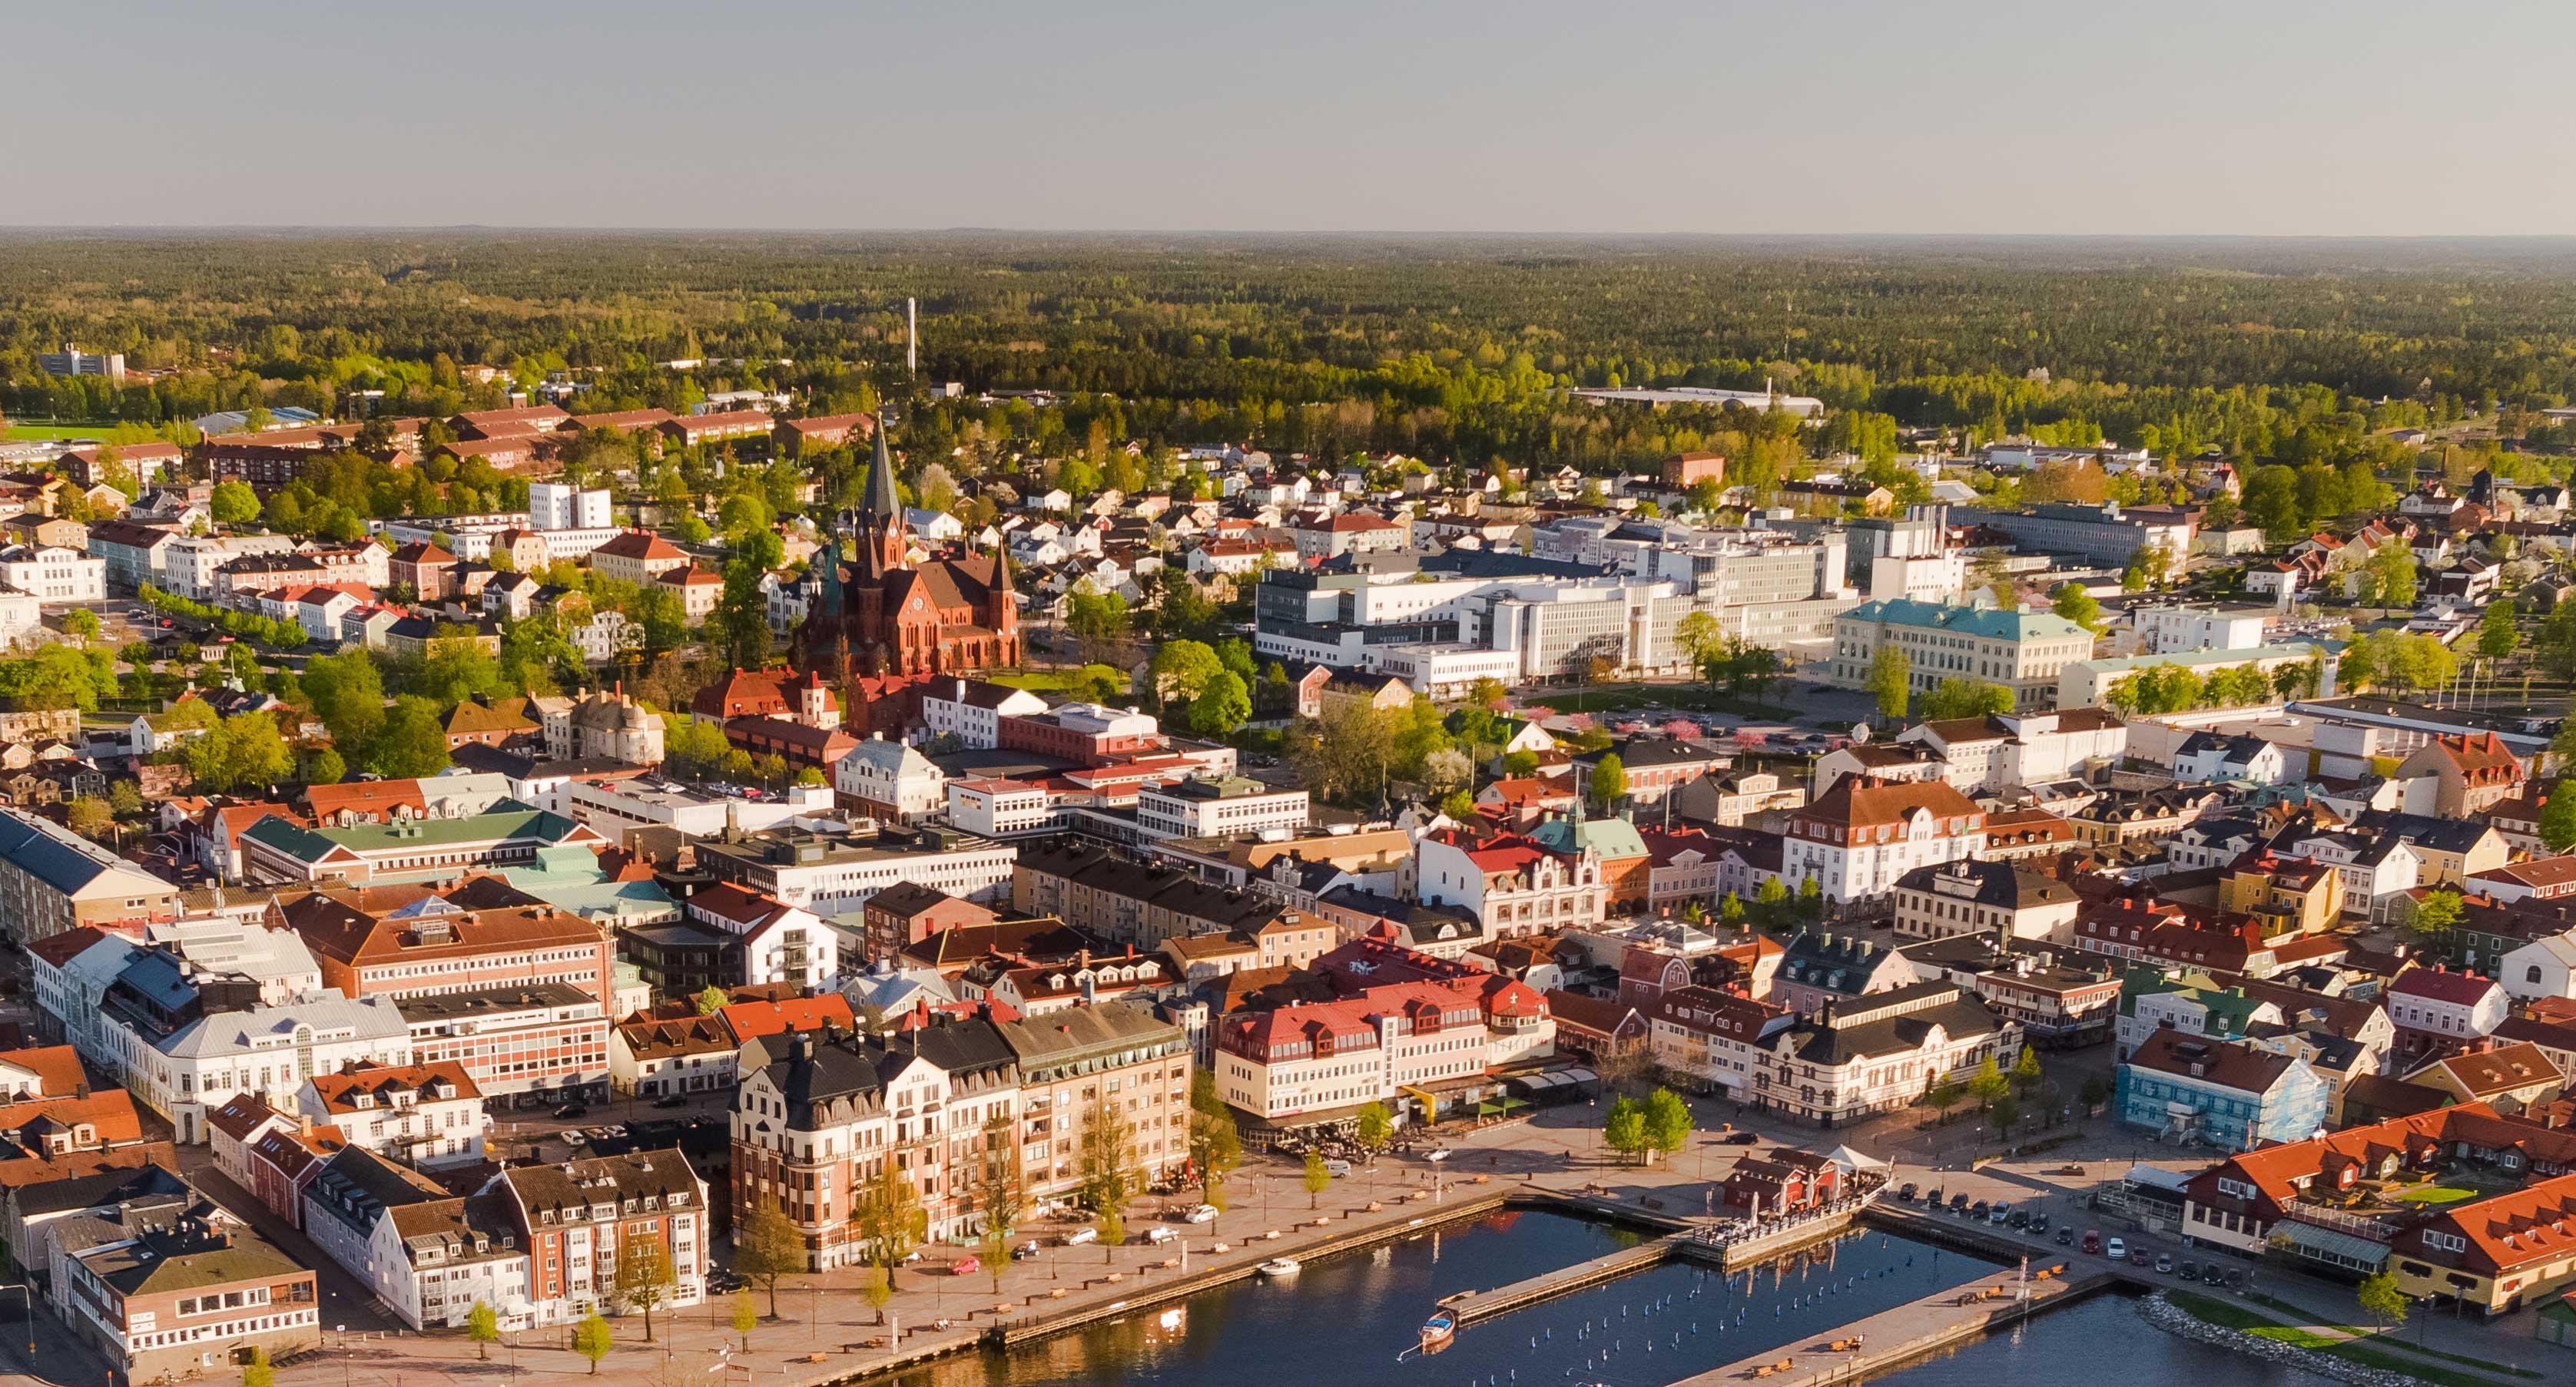 Lilla Rt ngalag Sex Tomt 103 S Vstervik karta - unam.net